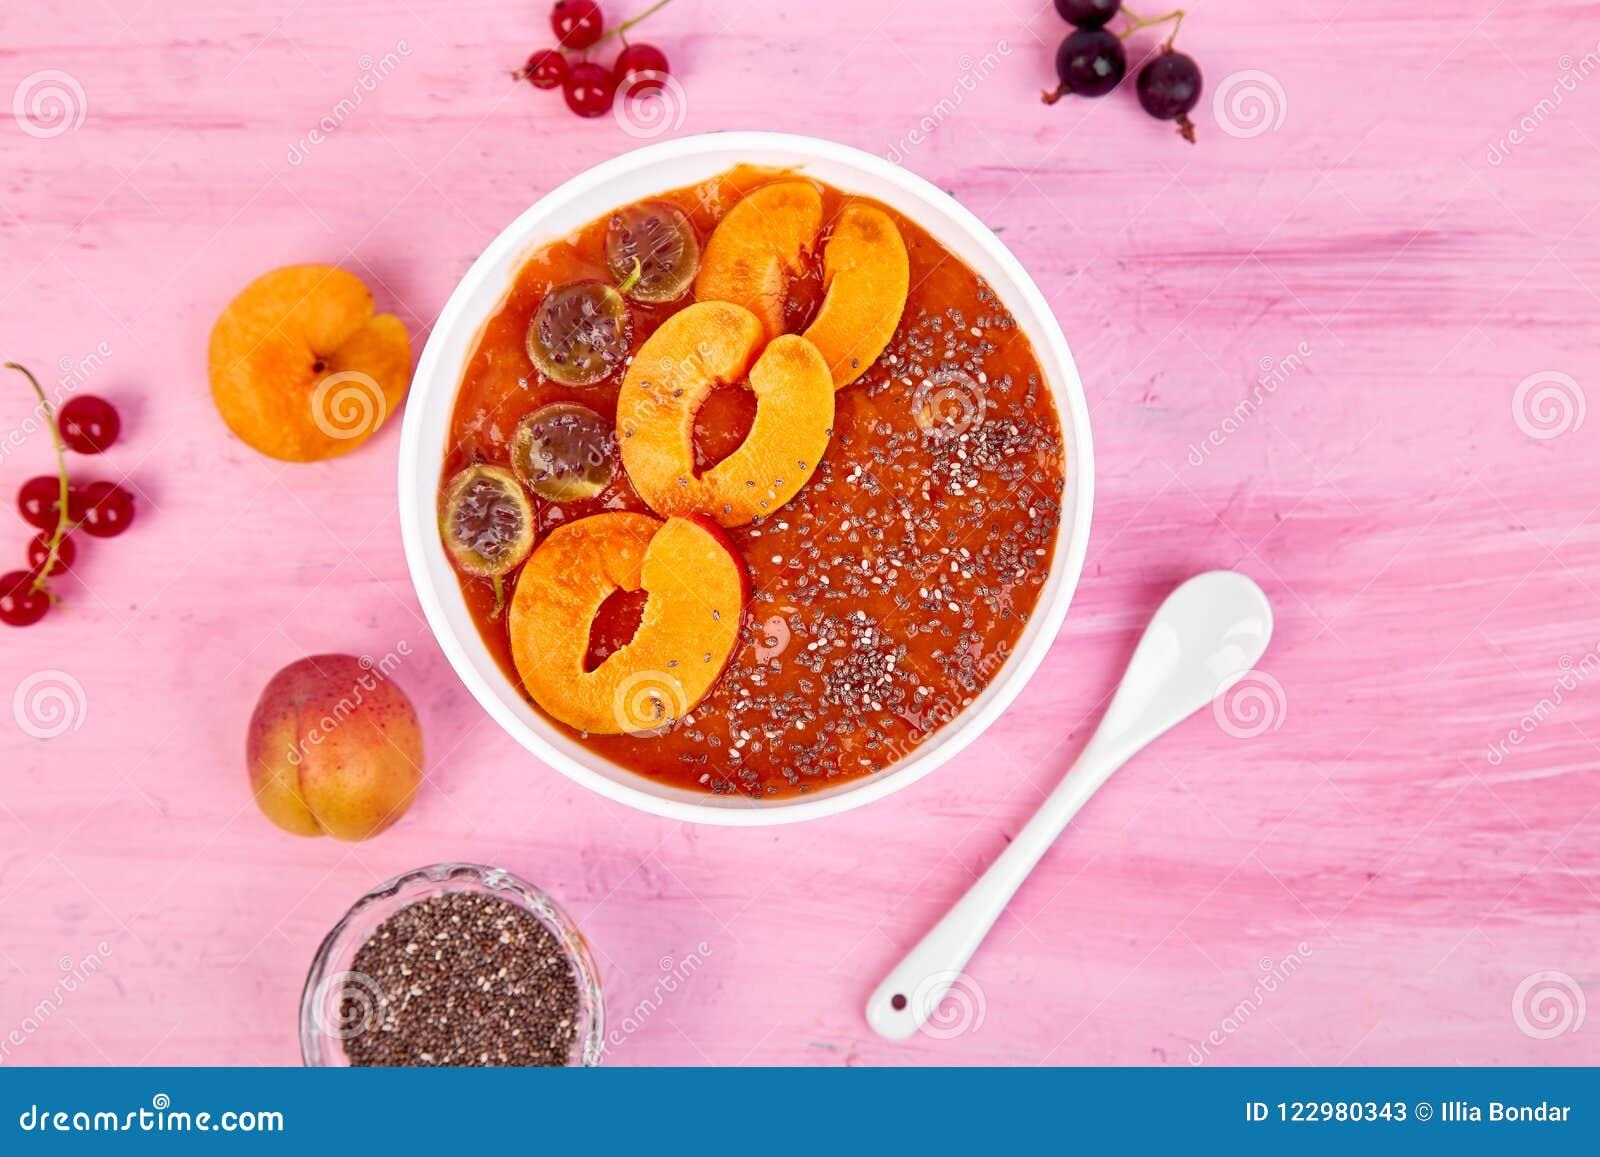 smoothie bowl, healthy, breakfast, food, yum! | Smoothie